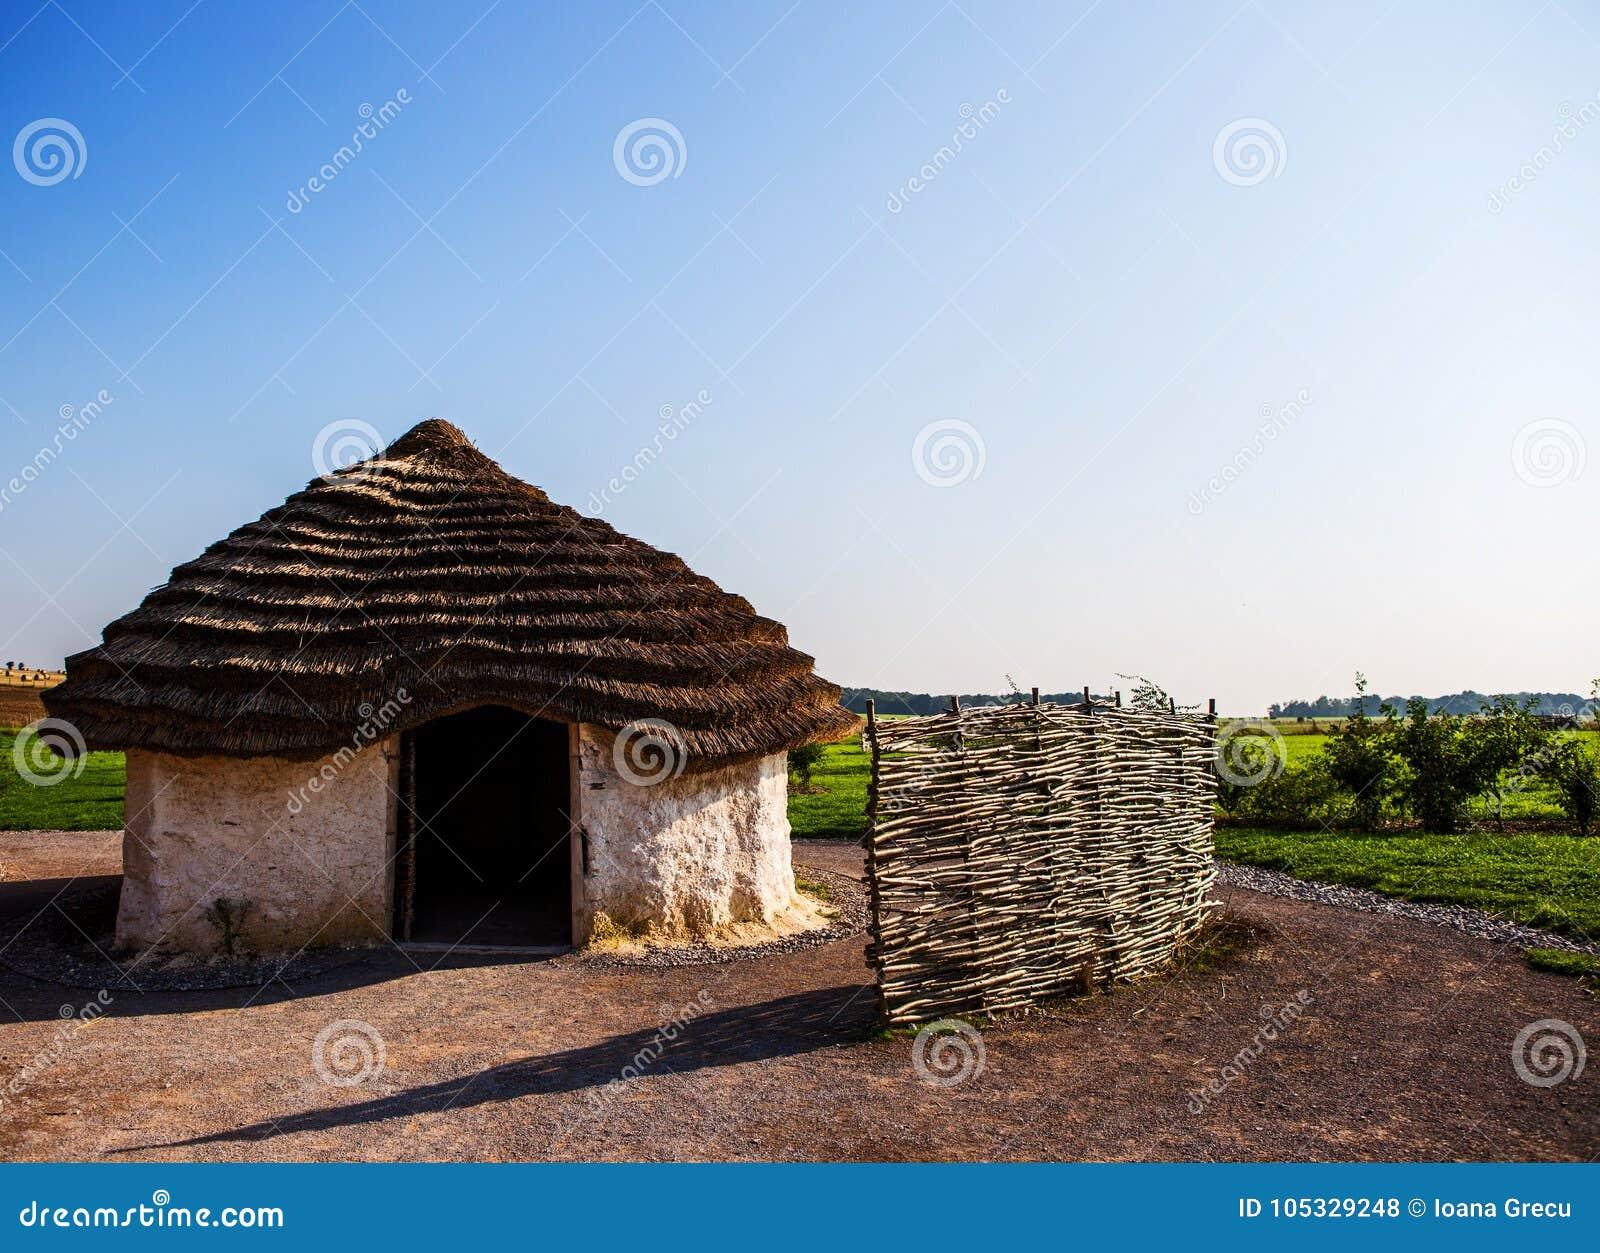 Stonehenge visitors` center